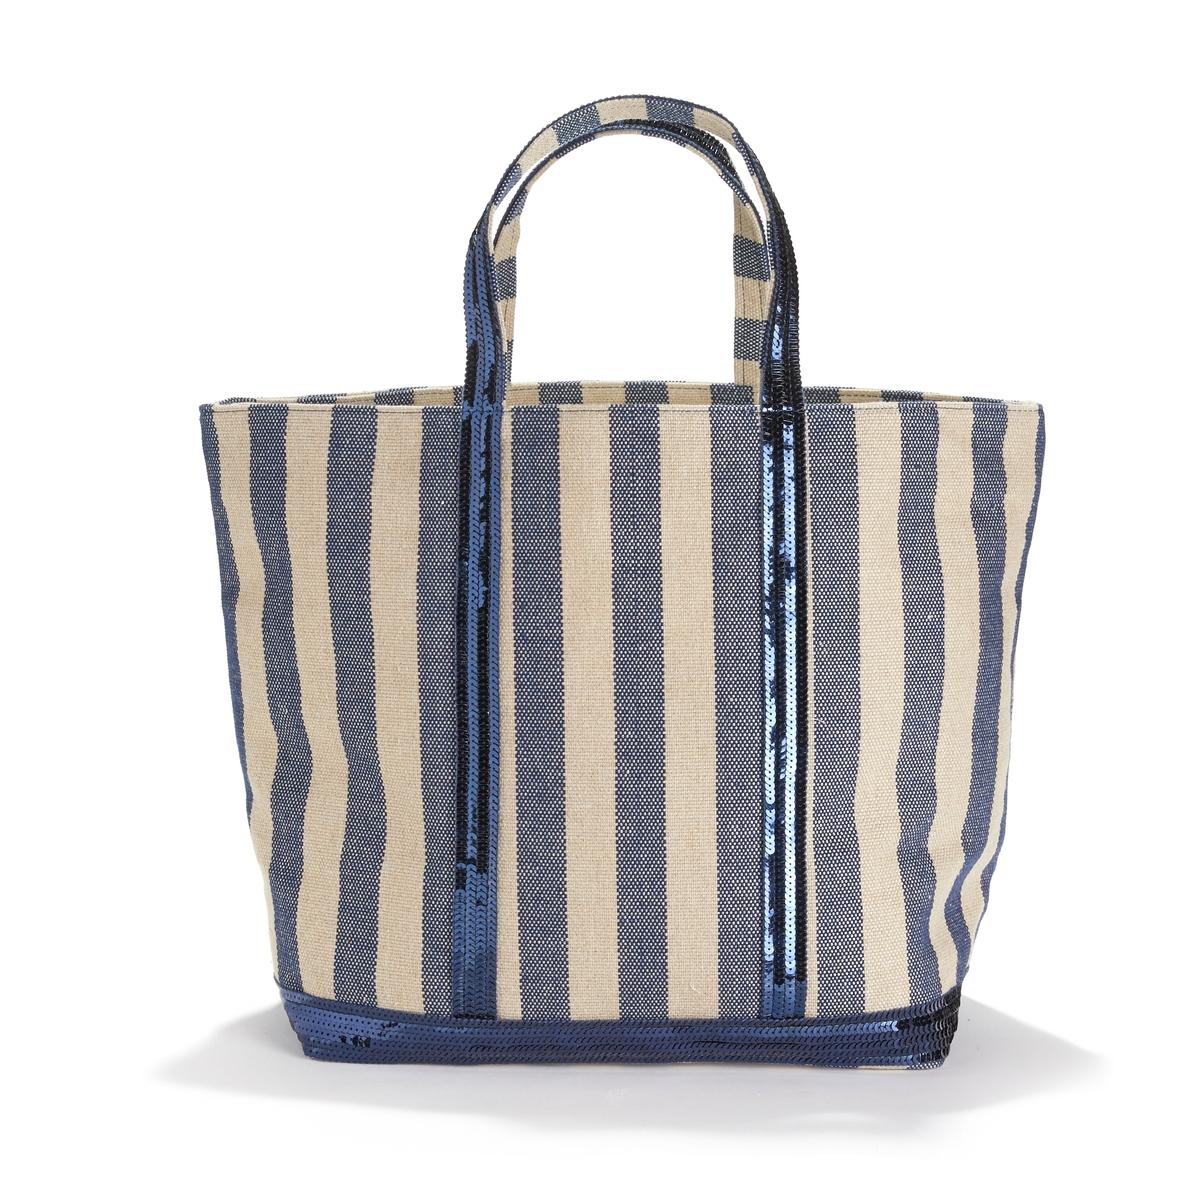 Сумка-шоппер в полоску с блестками из ткани цена